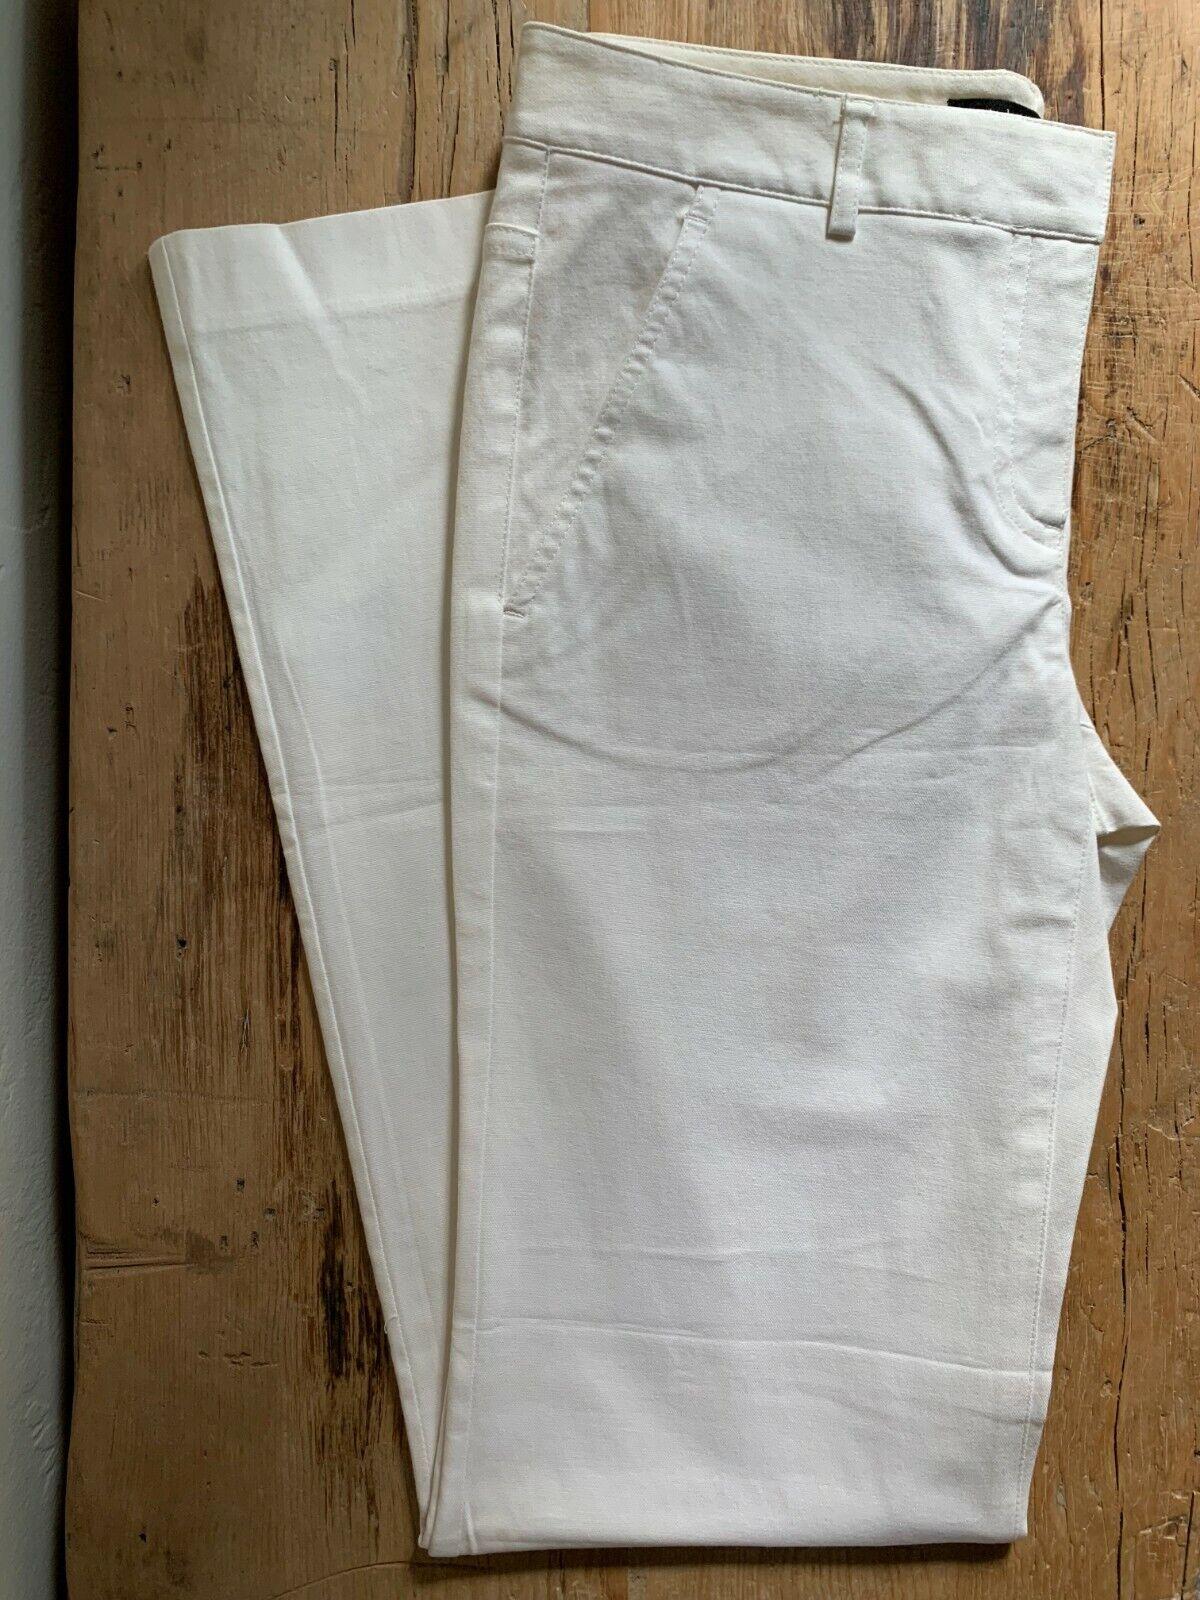 NEW  Theory White Stretch Cotton Bootcut Leg Pants Size 6